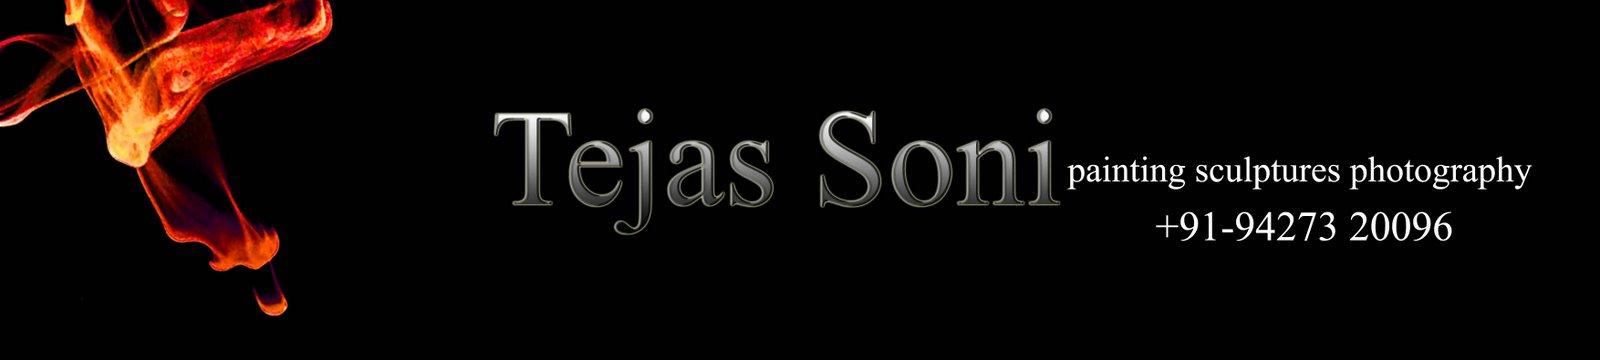 Tejas Soni